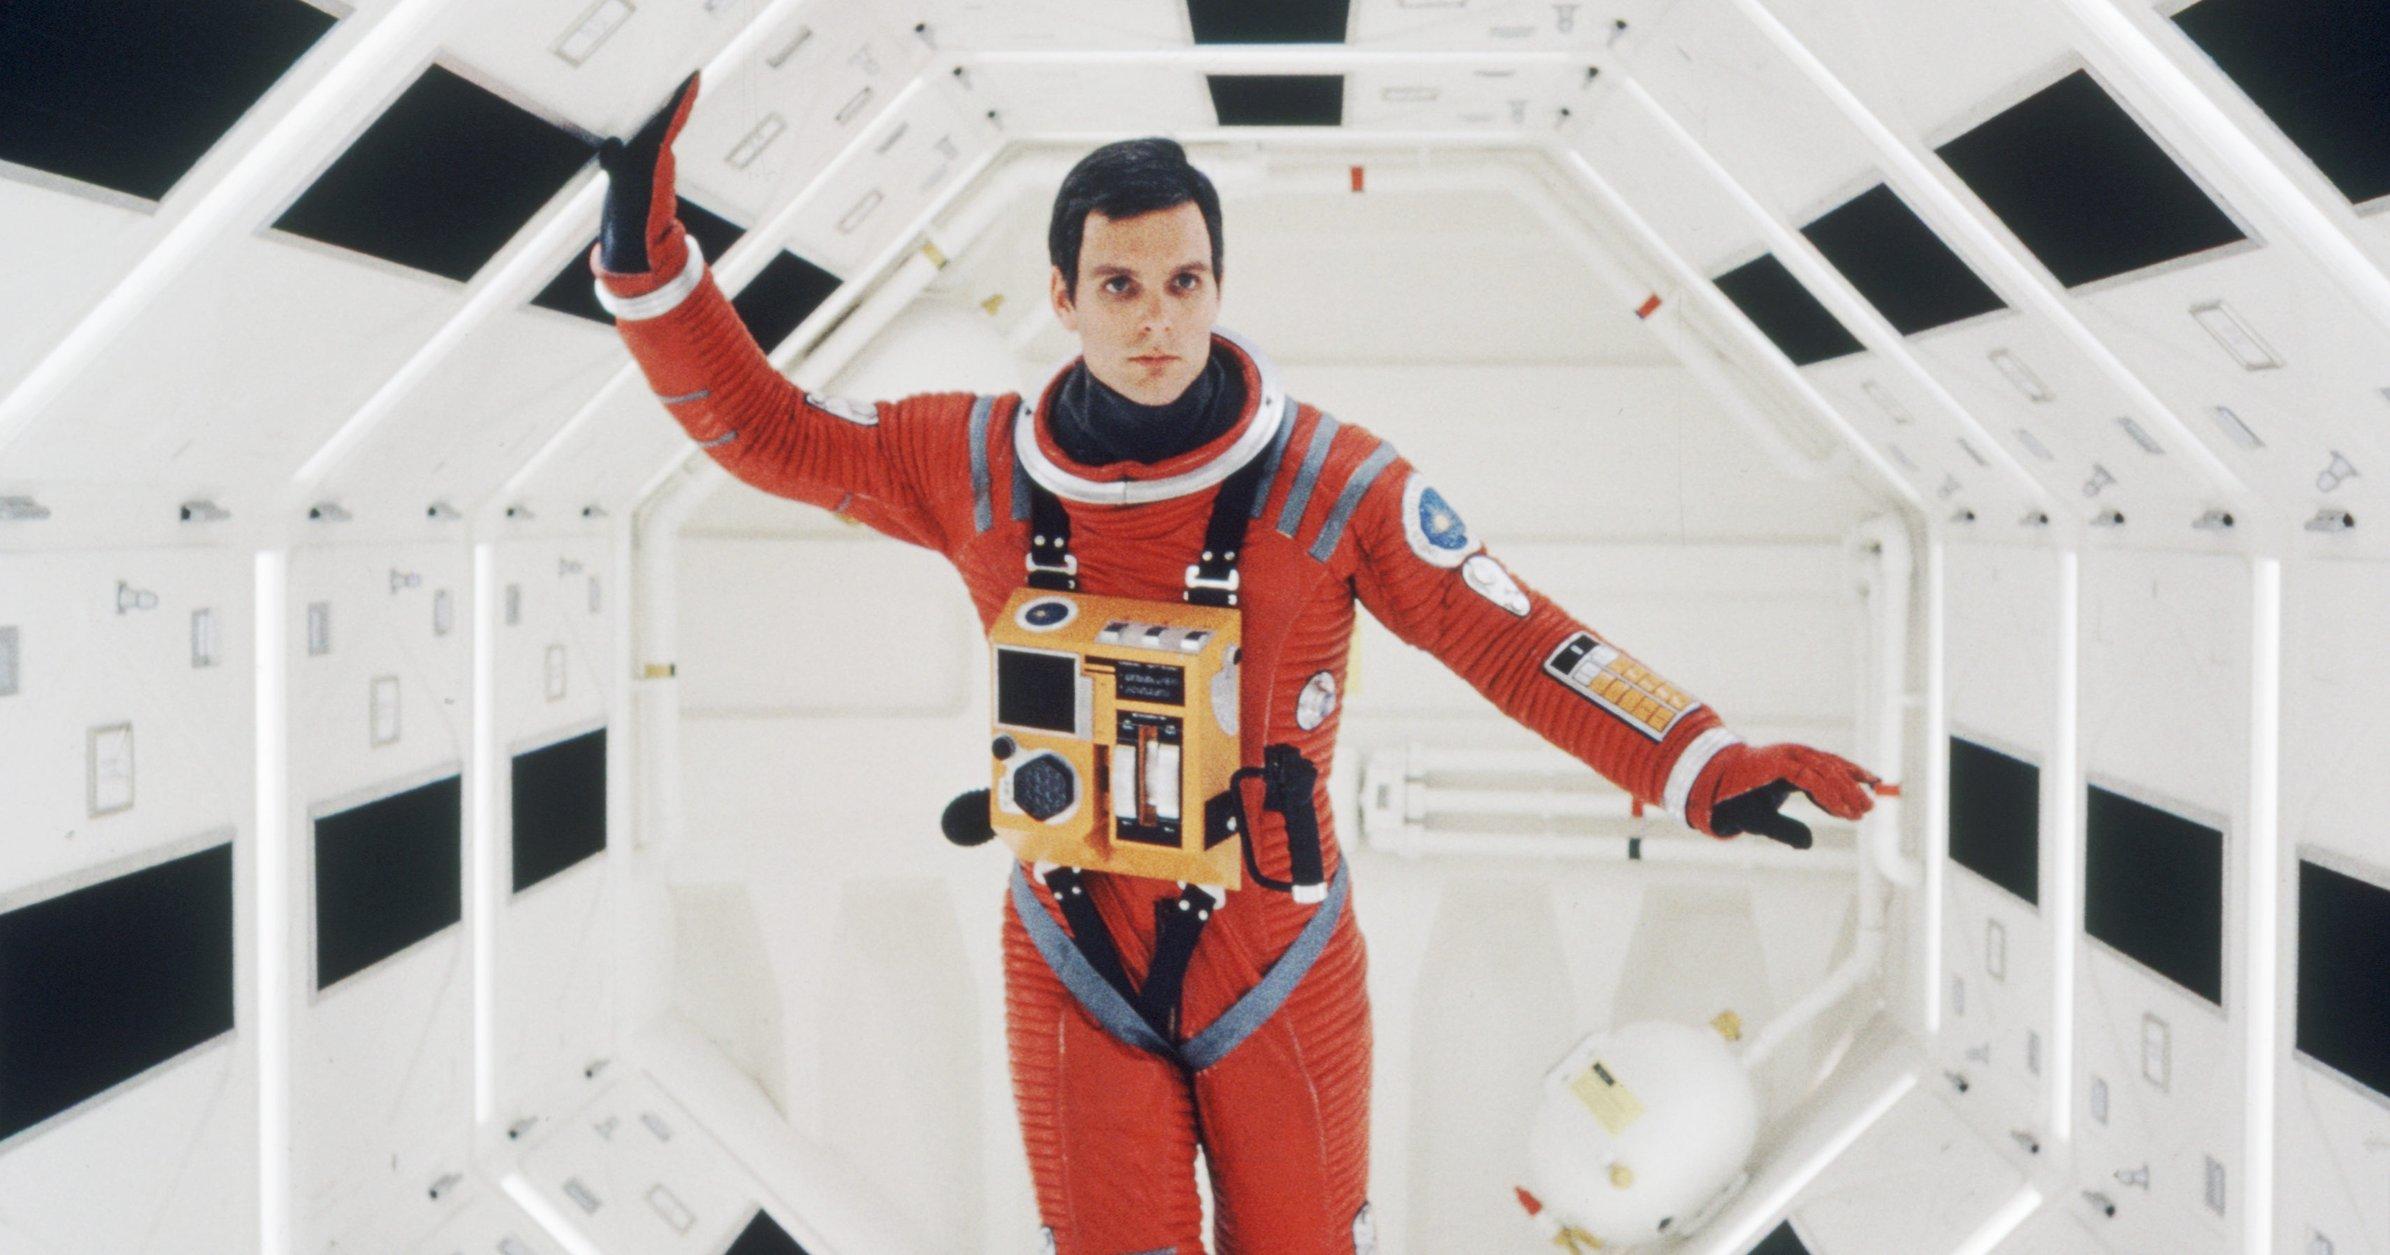 2001: A Space Odyssey filmi